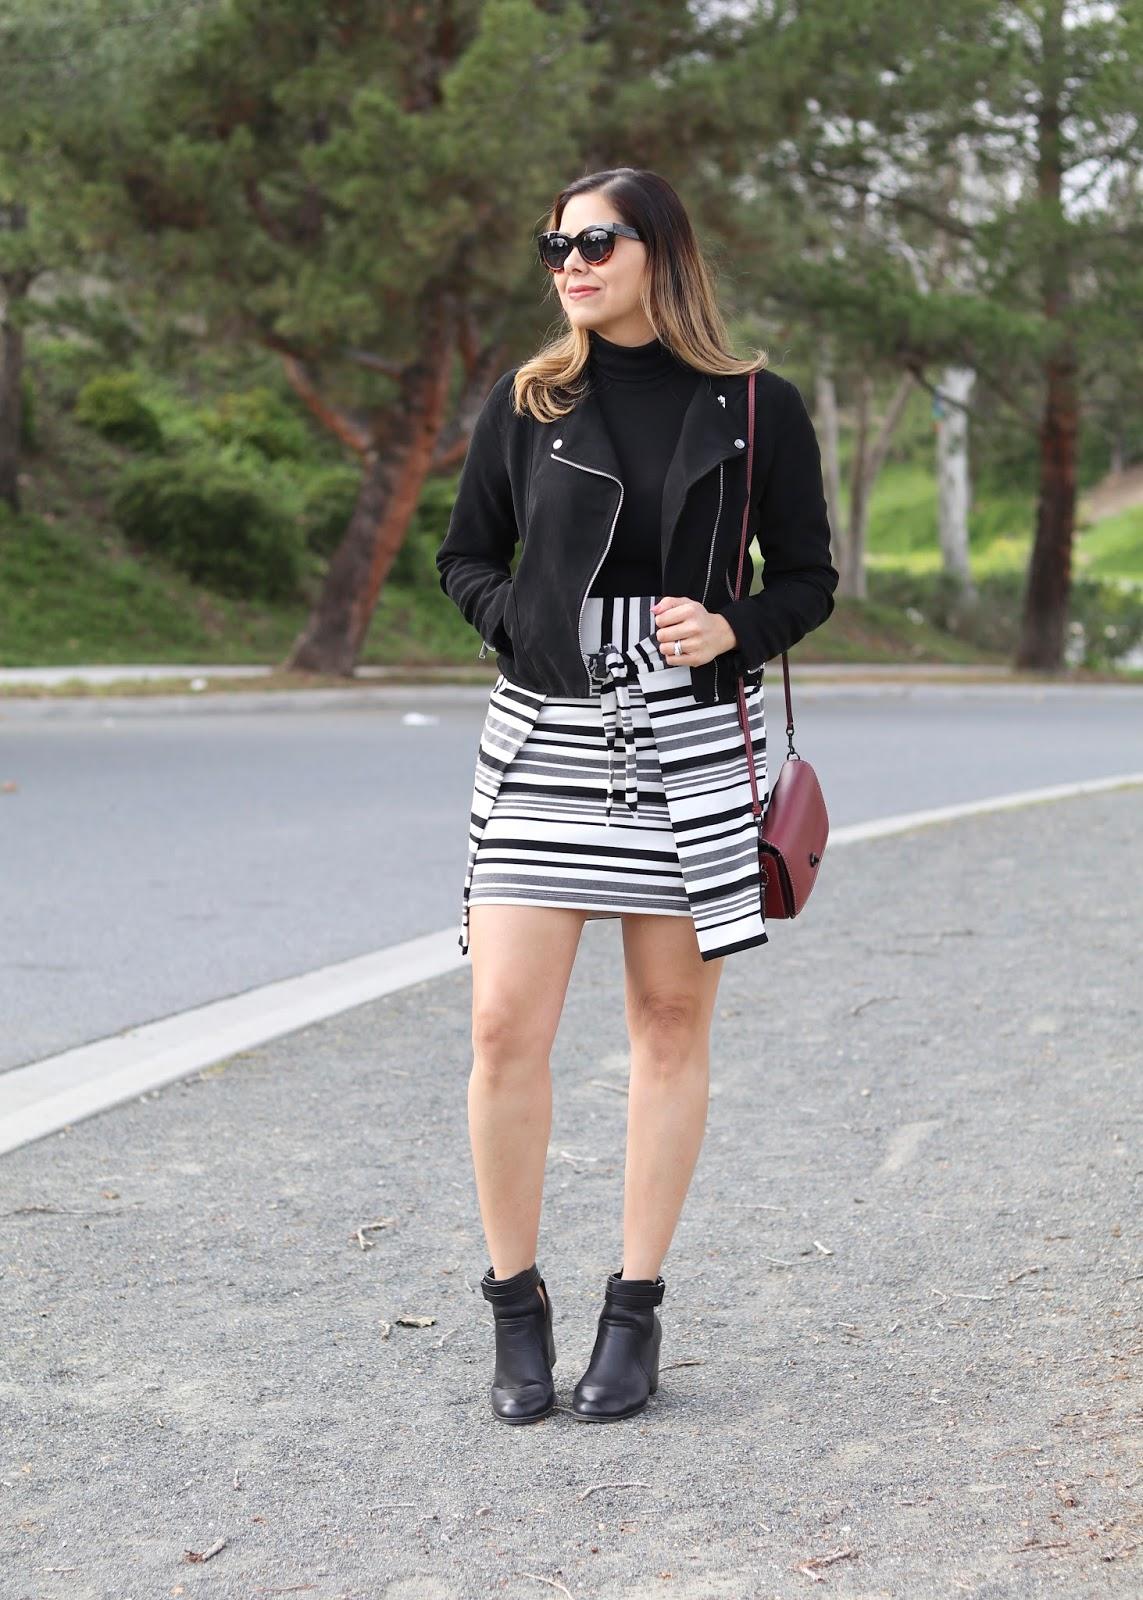 San Diego Fashion Blogger, San Diego Style Blogger, Top San Diego blogger